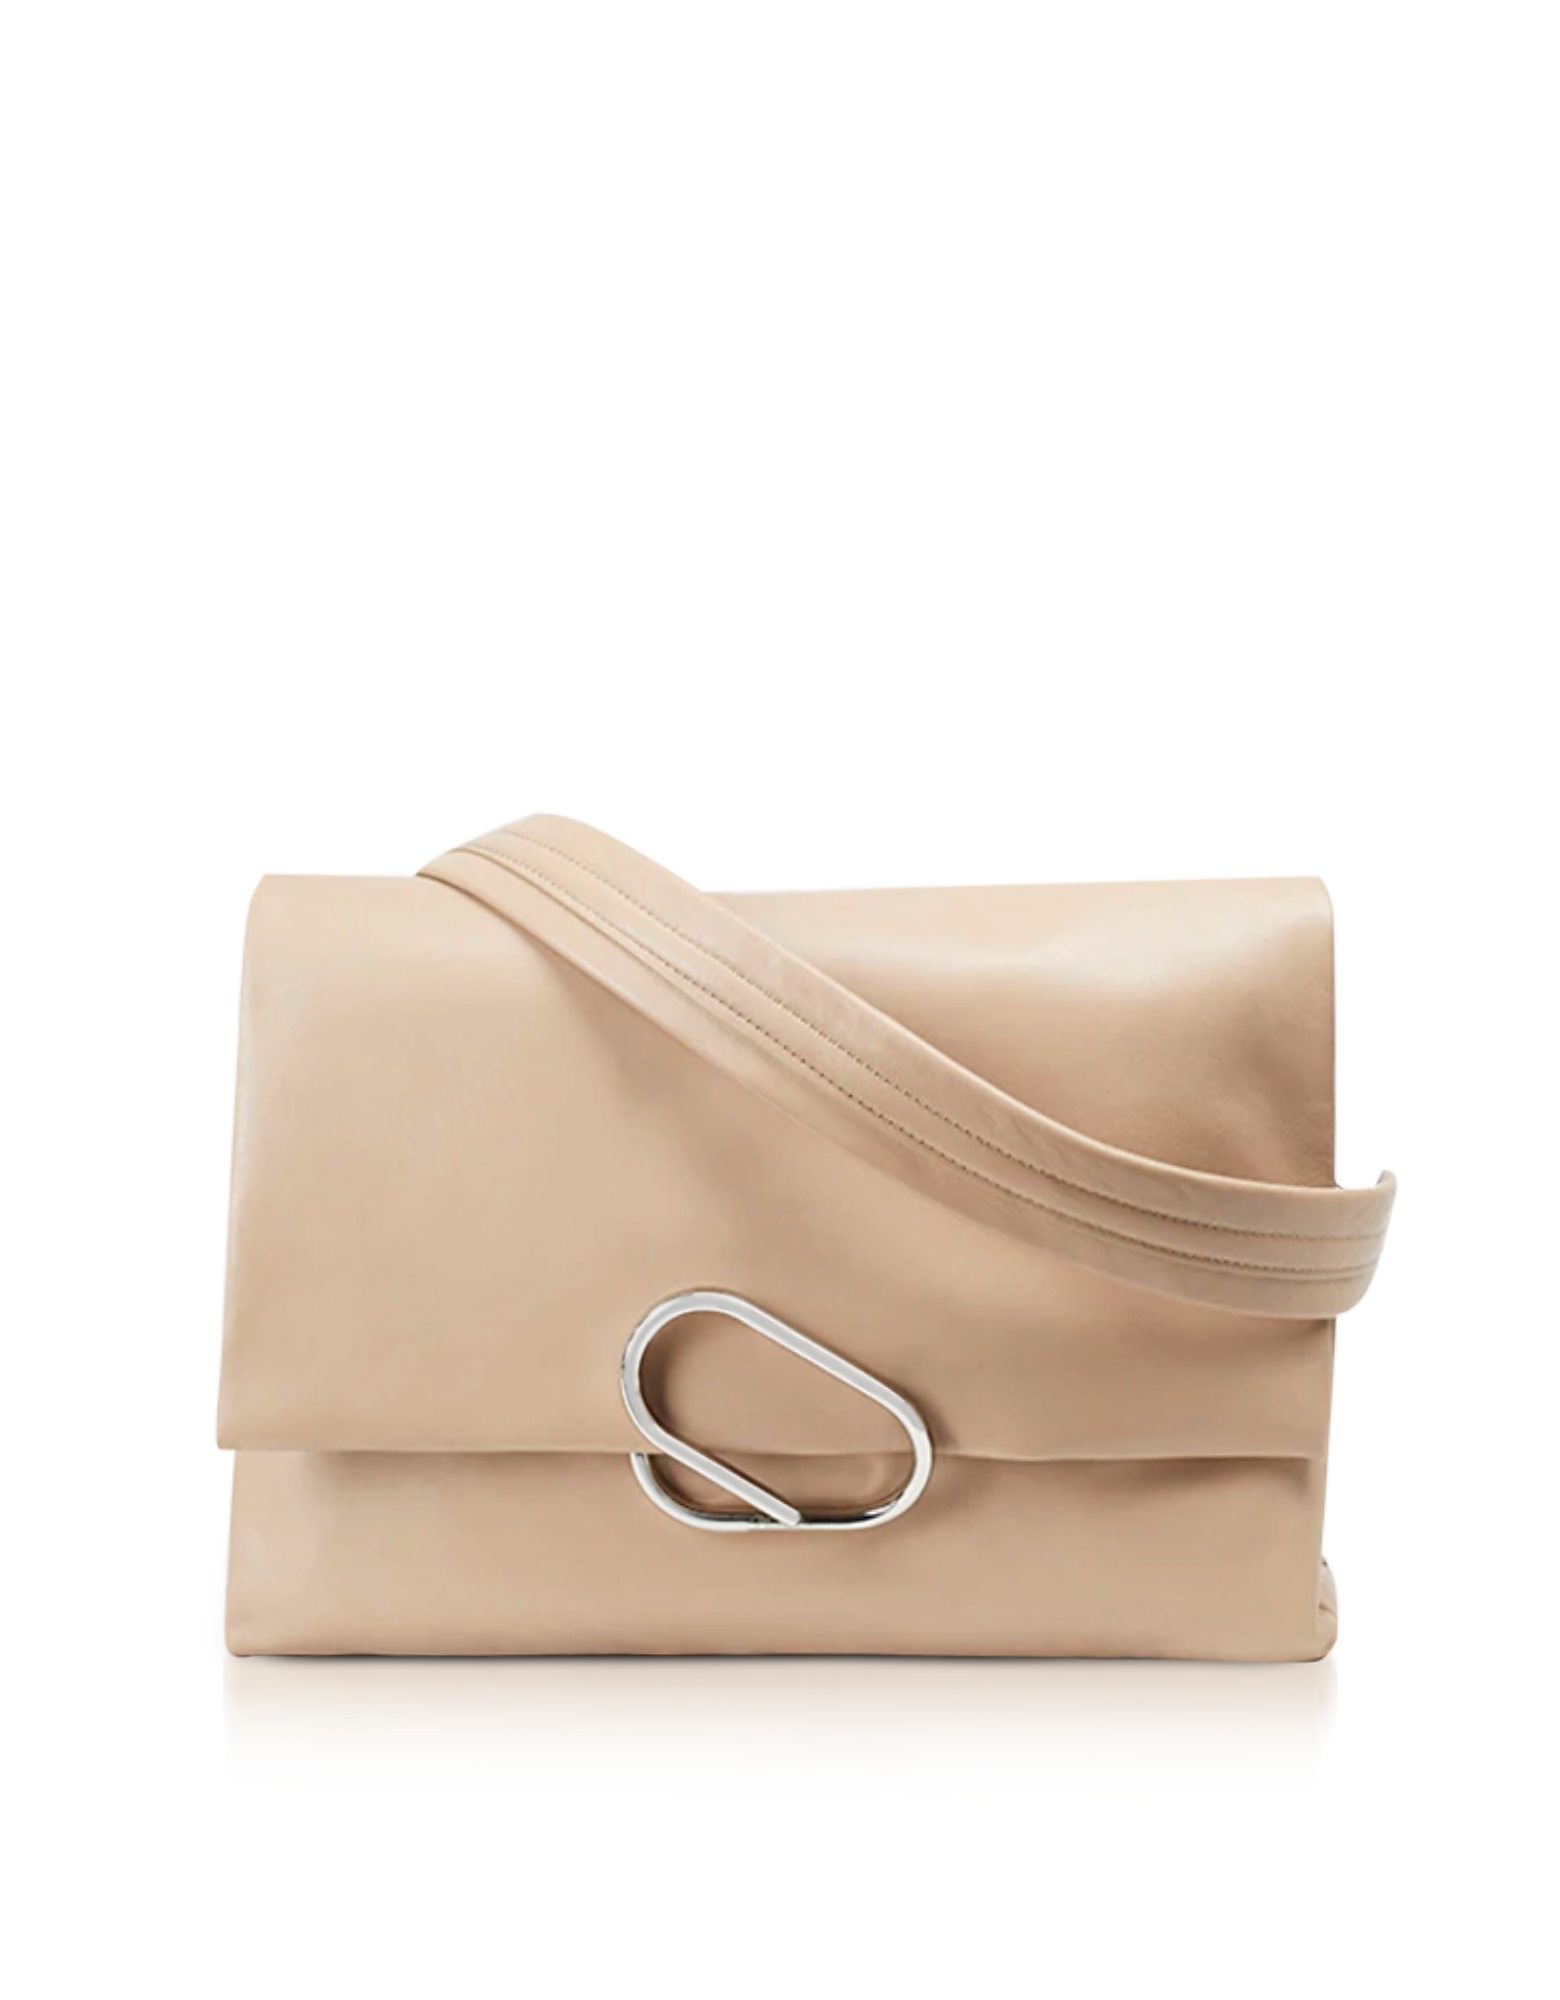 3.1 Phillip Lim Handbags, Alix Oversized Fawn Leather Shoulder Bag